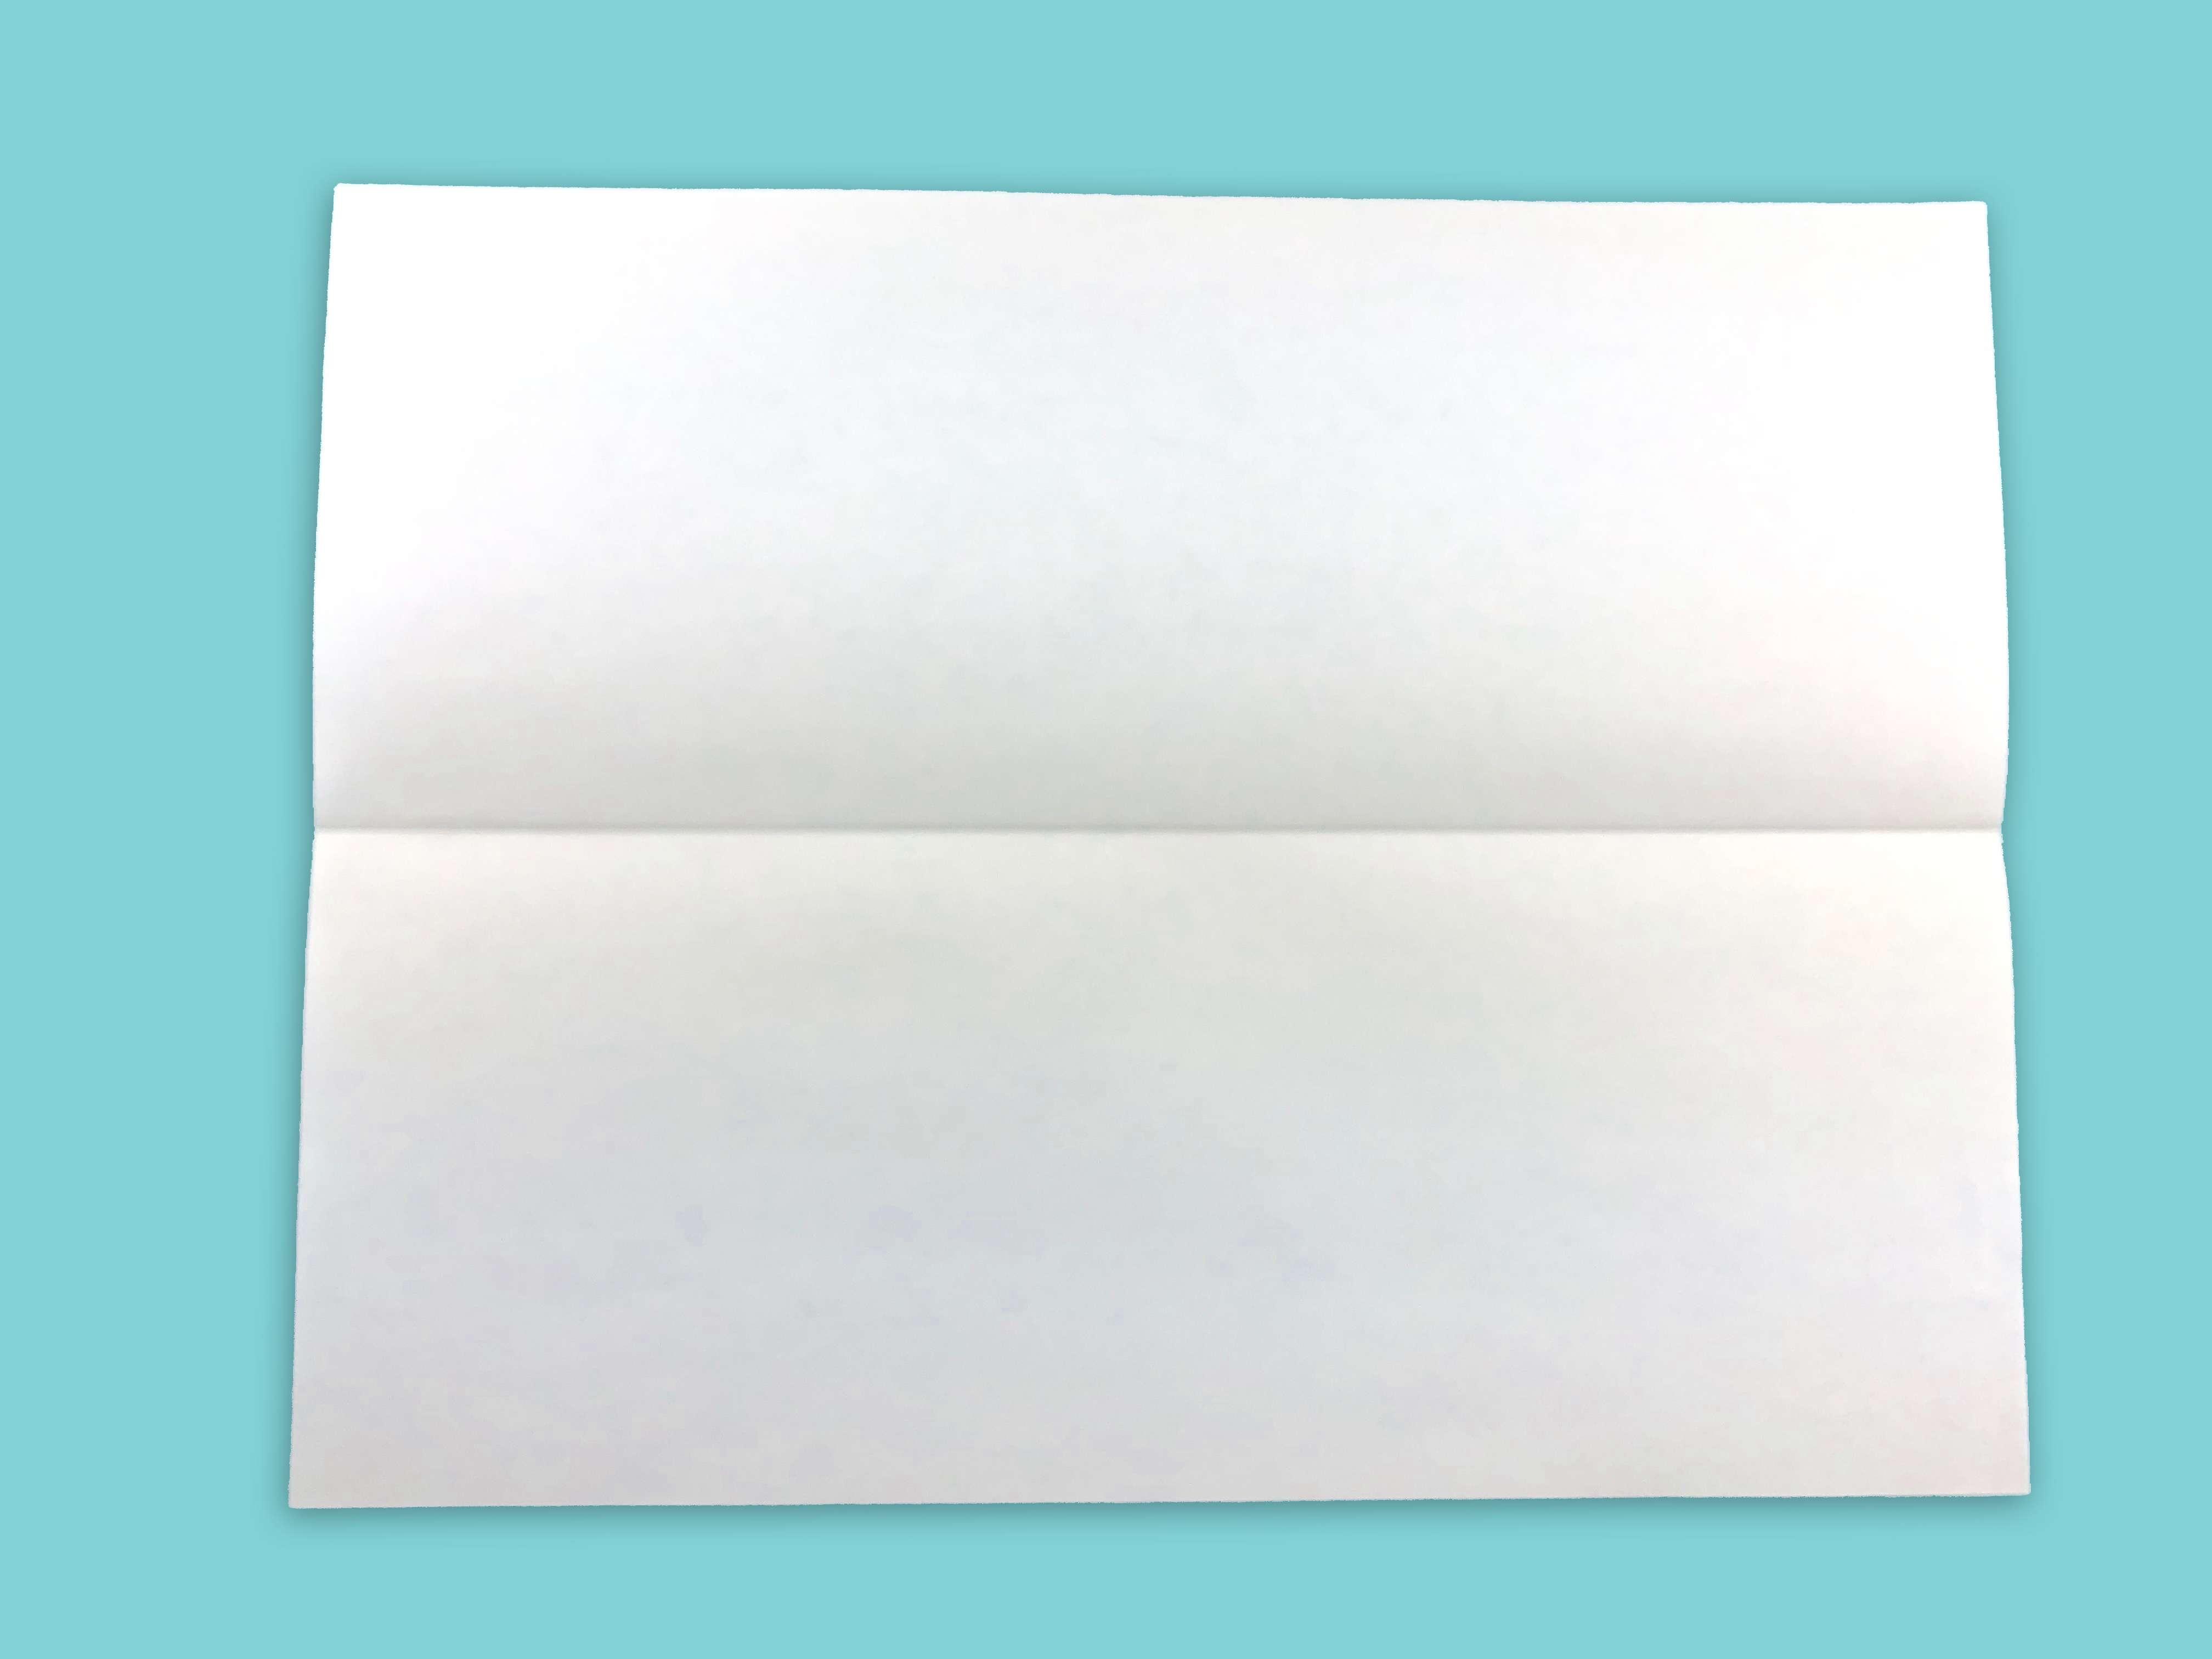 Folded sheet of paper